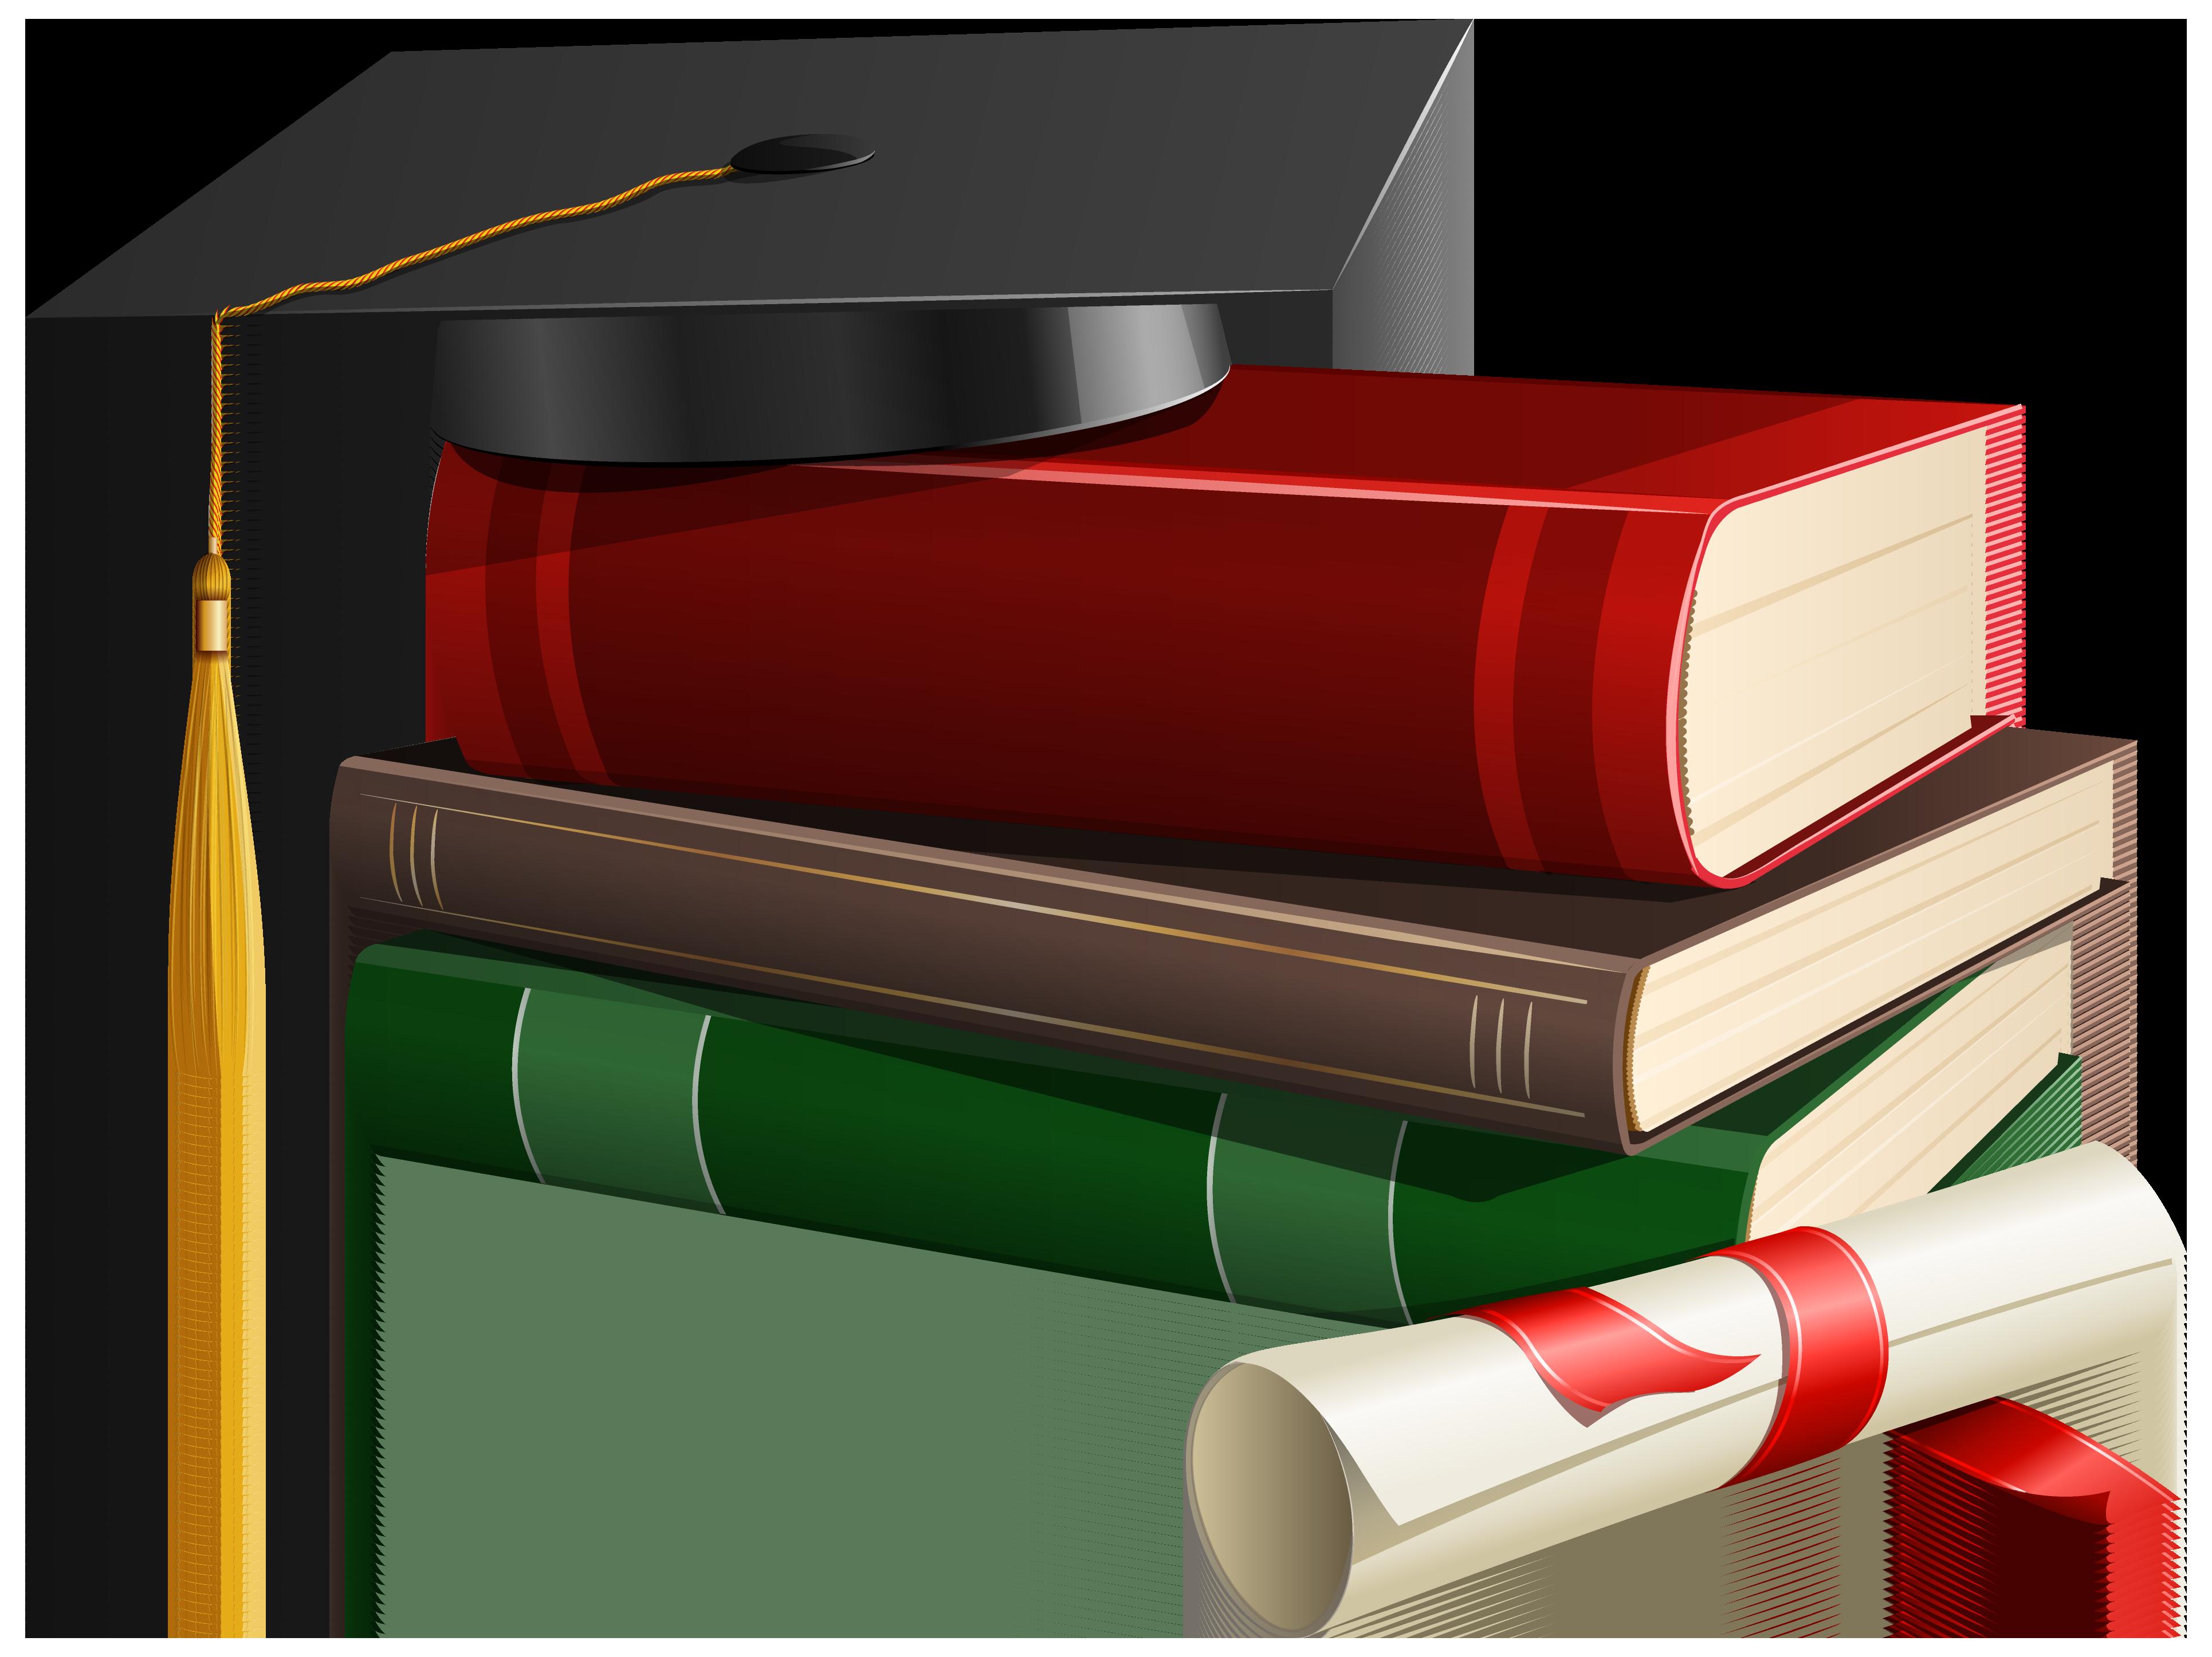 Diploma clipart doctoral degree. Square academic cap graduation